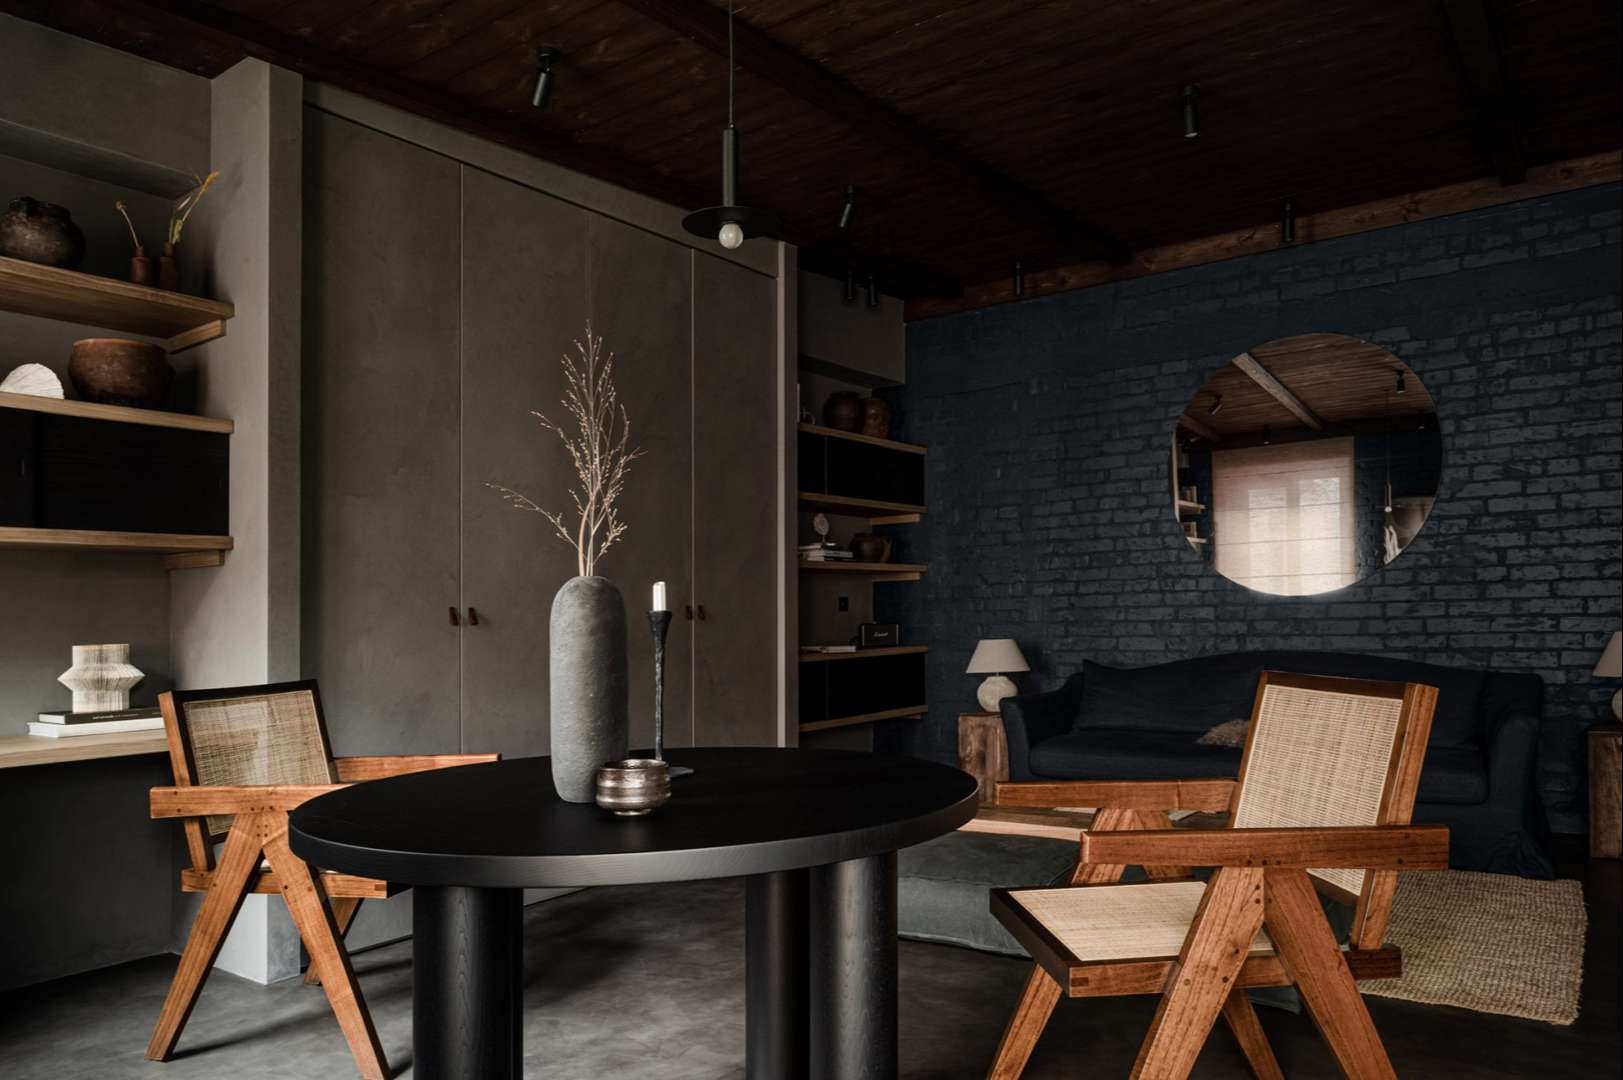 olga-fradina-kyiv-apartment-interior_dezeen_2364_col_11-2048x1363